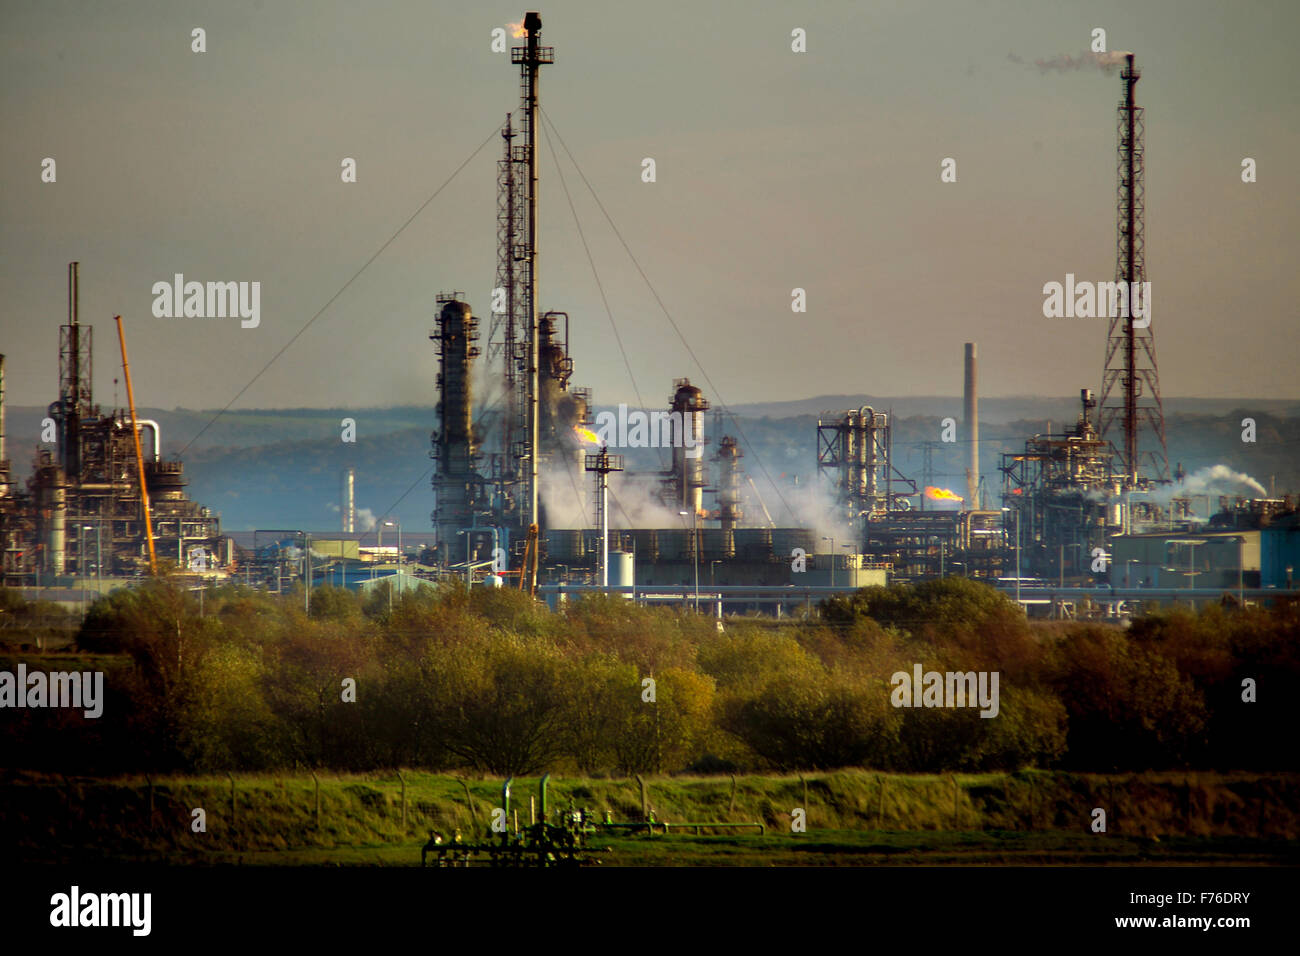 Industrial plant, Teeside - Stock Image